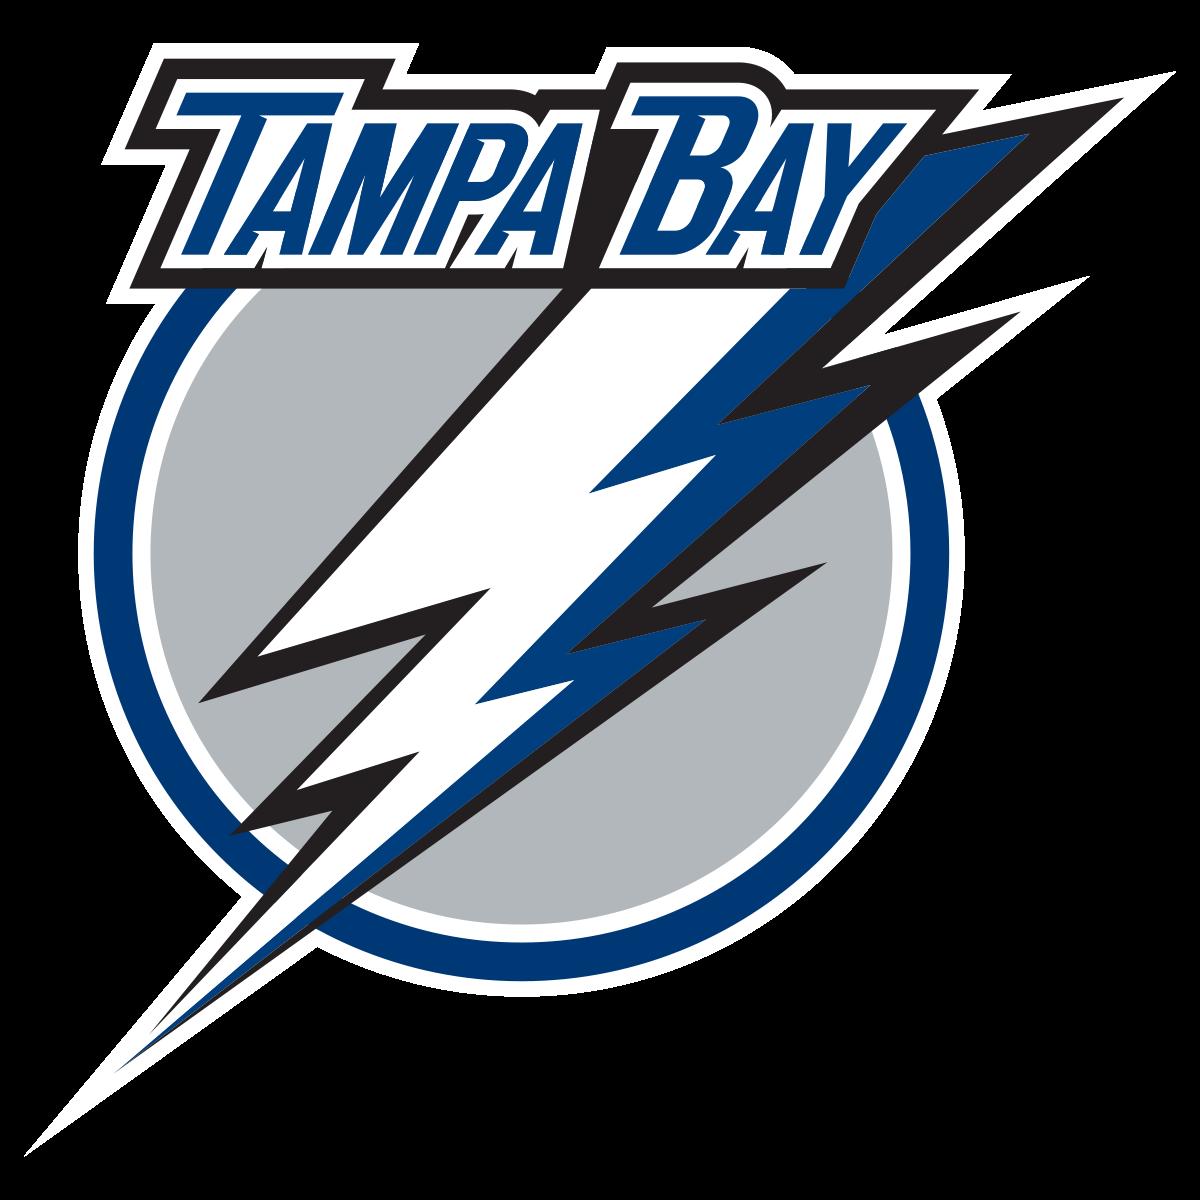 Pin By Tayx4 On Nhl Logos Tampa Bay Lightning Tampa Bay Lightning Logo Tampa Bay [ 1200 x 1200 Pixel ]